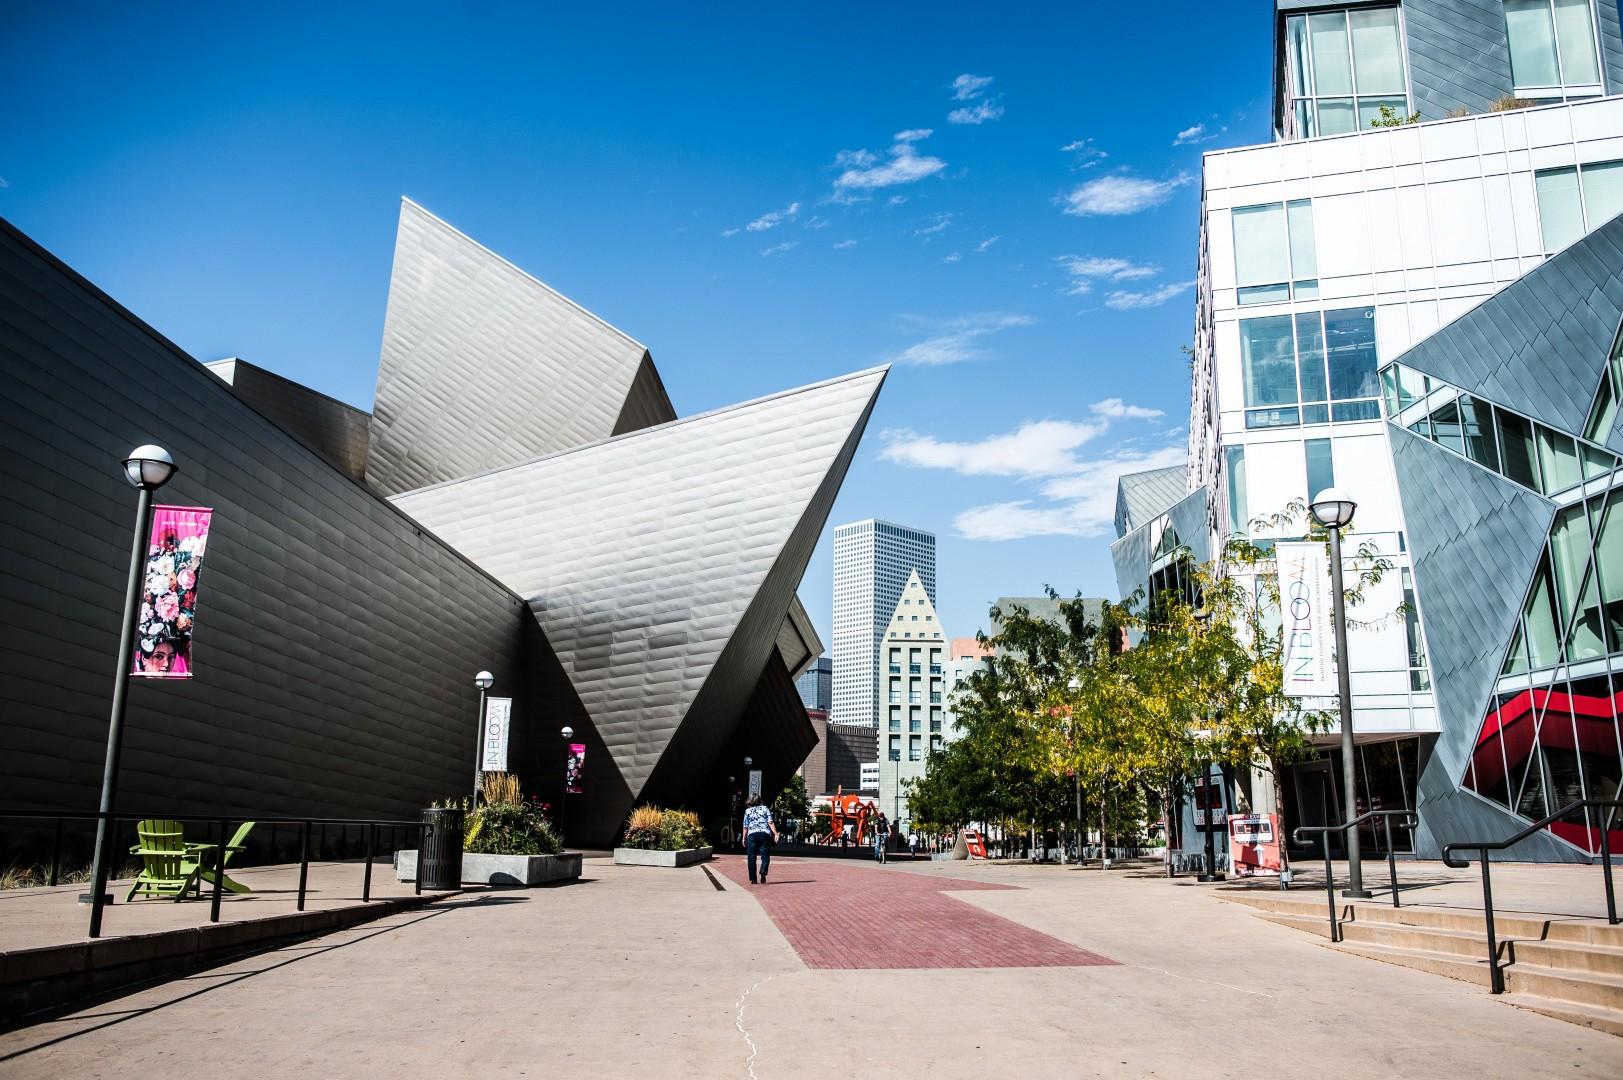 diDUknow Upcoming exhibits at the Denver Art Museum  DU Clarion